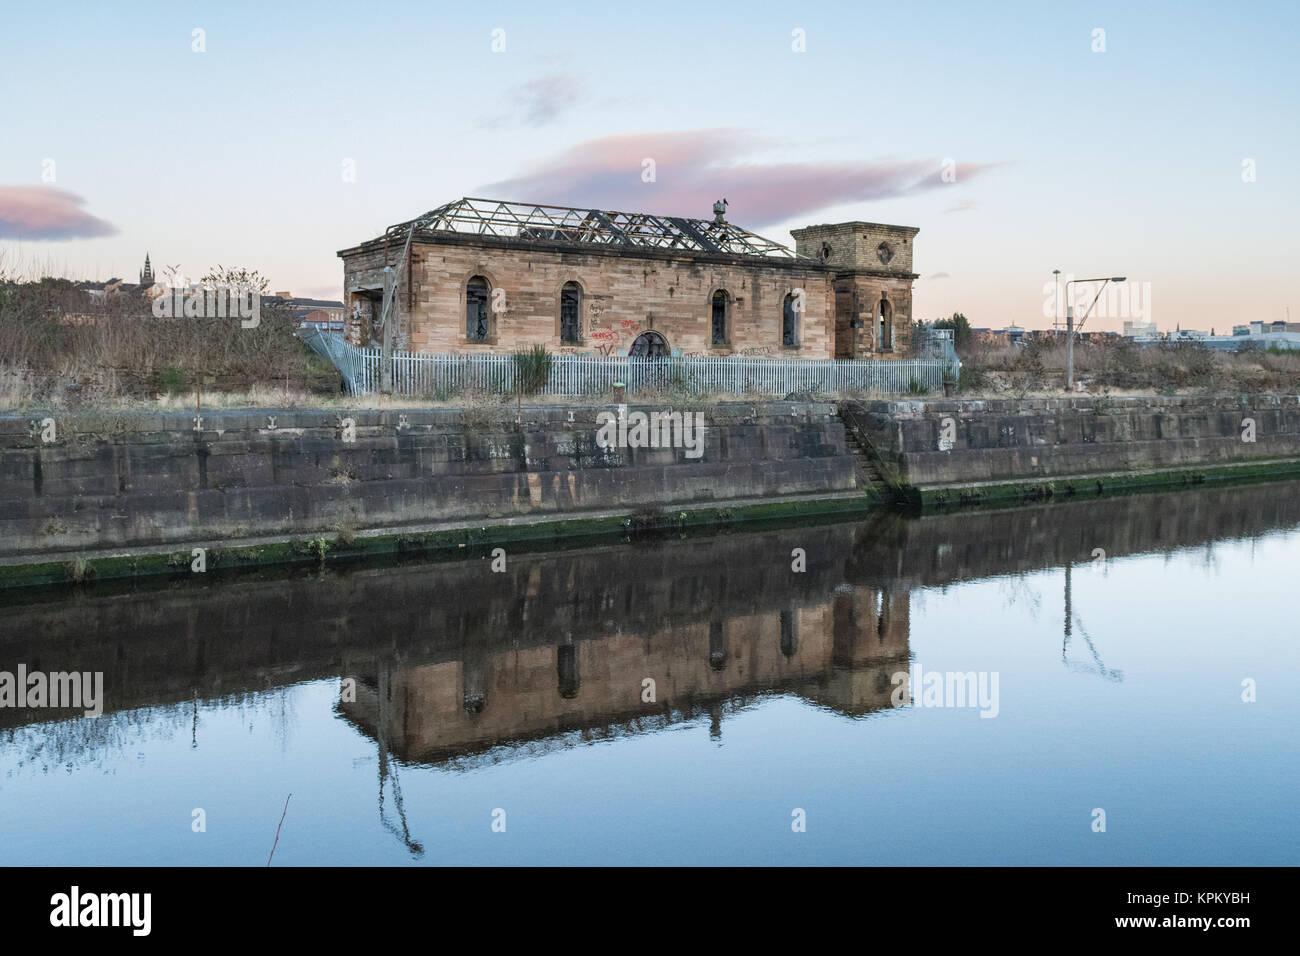 The Pump House, Govan Graving Docks, Glasgow, Scotland, UK - Stock Image